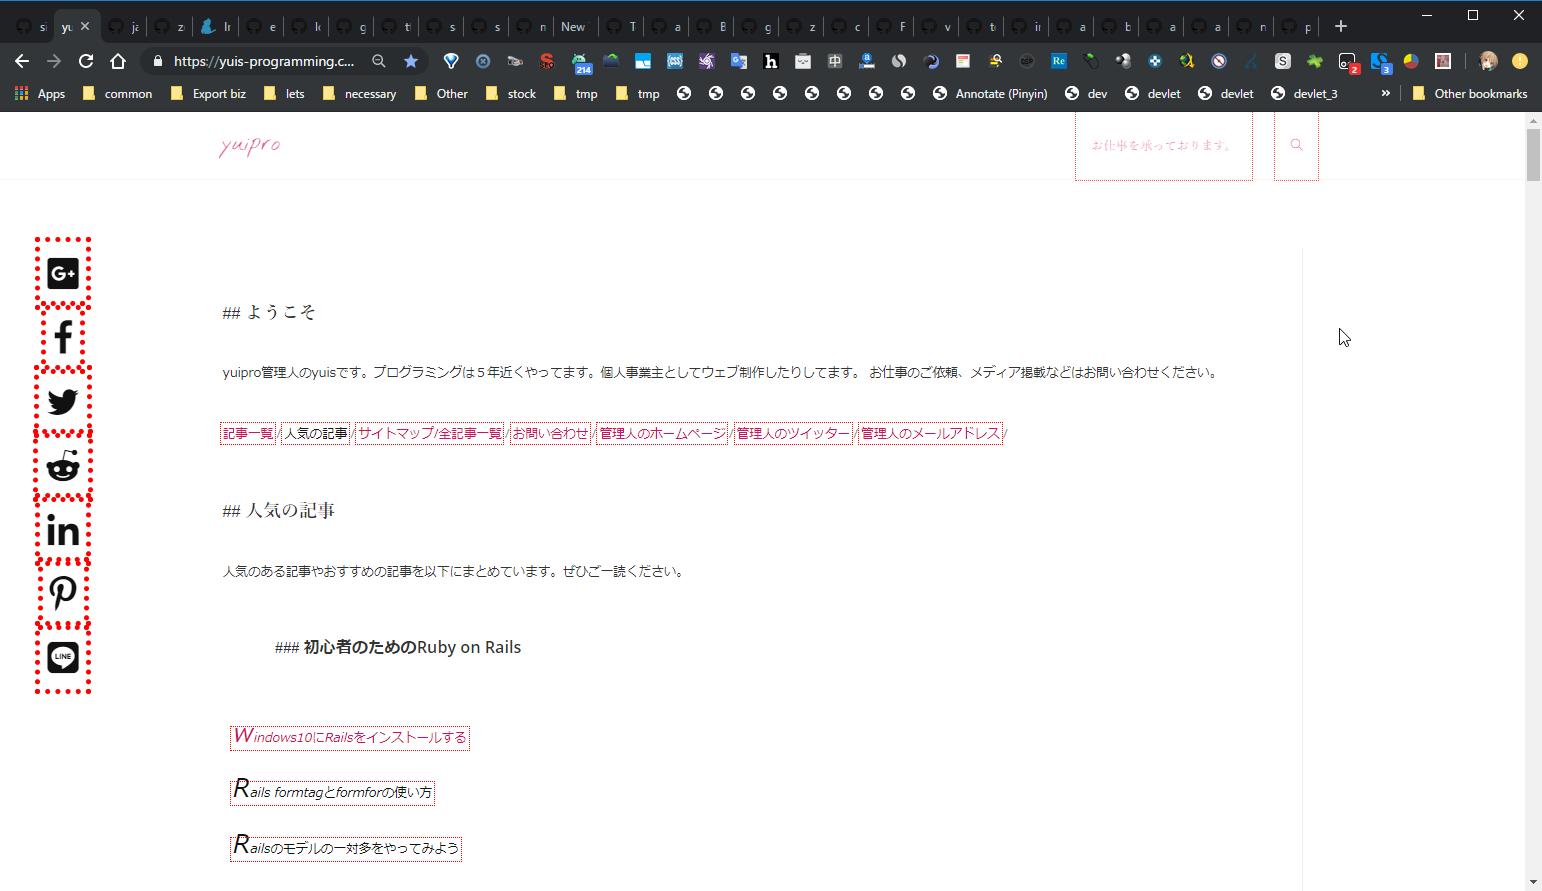 https://yuis.xsrv.jp/images/ss/ShareX_ScreenShot_984c099e-8699-4a0f-9897-2ff3f0c02bb6.png